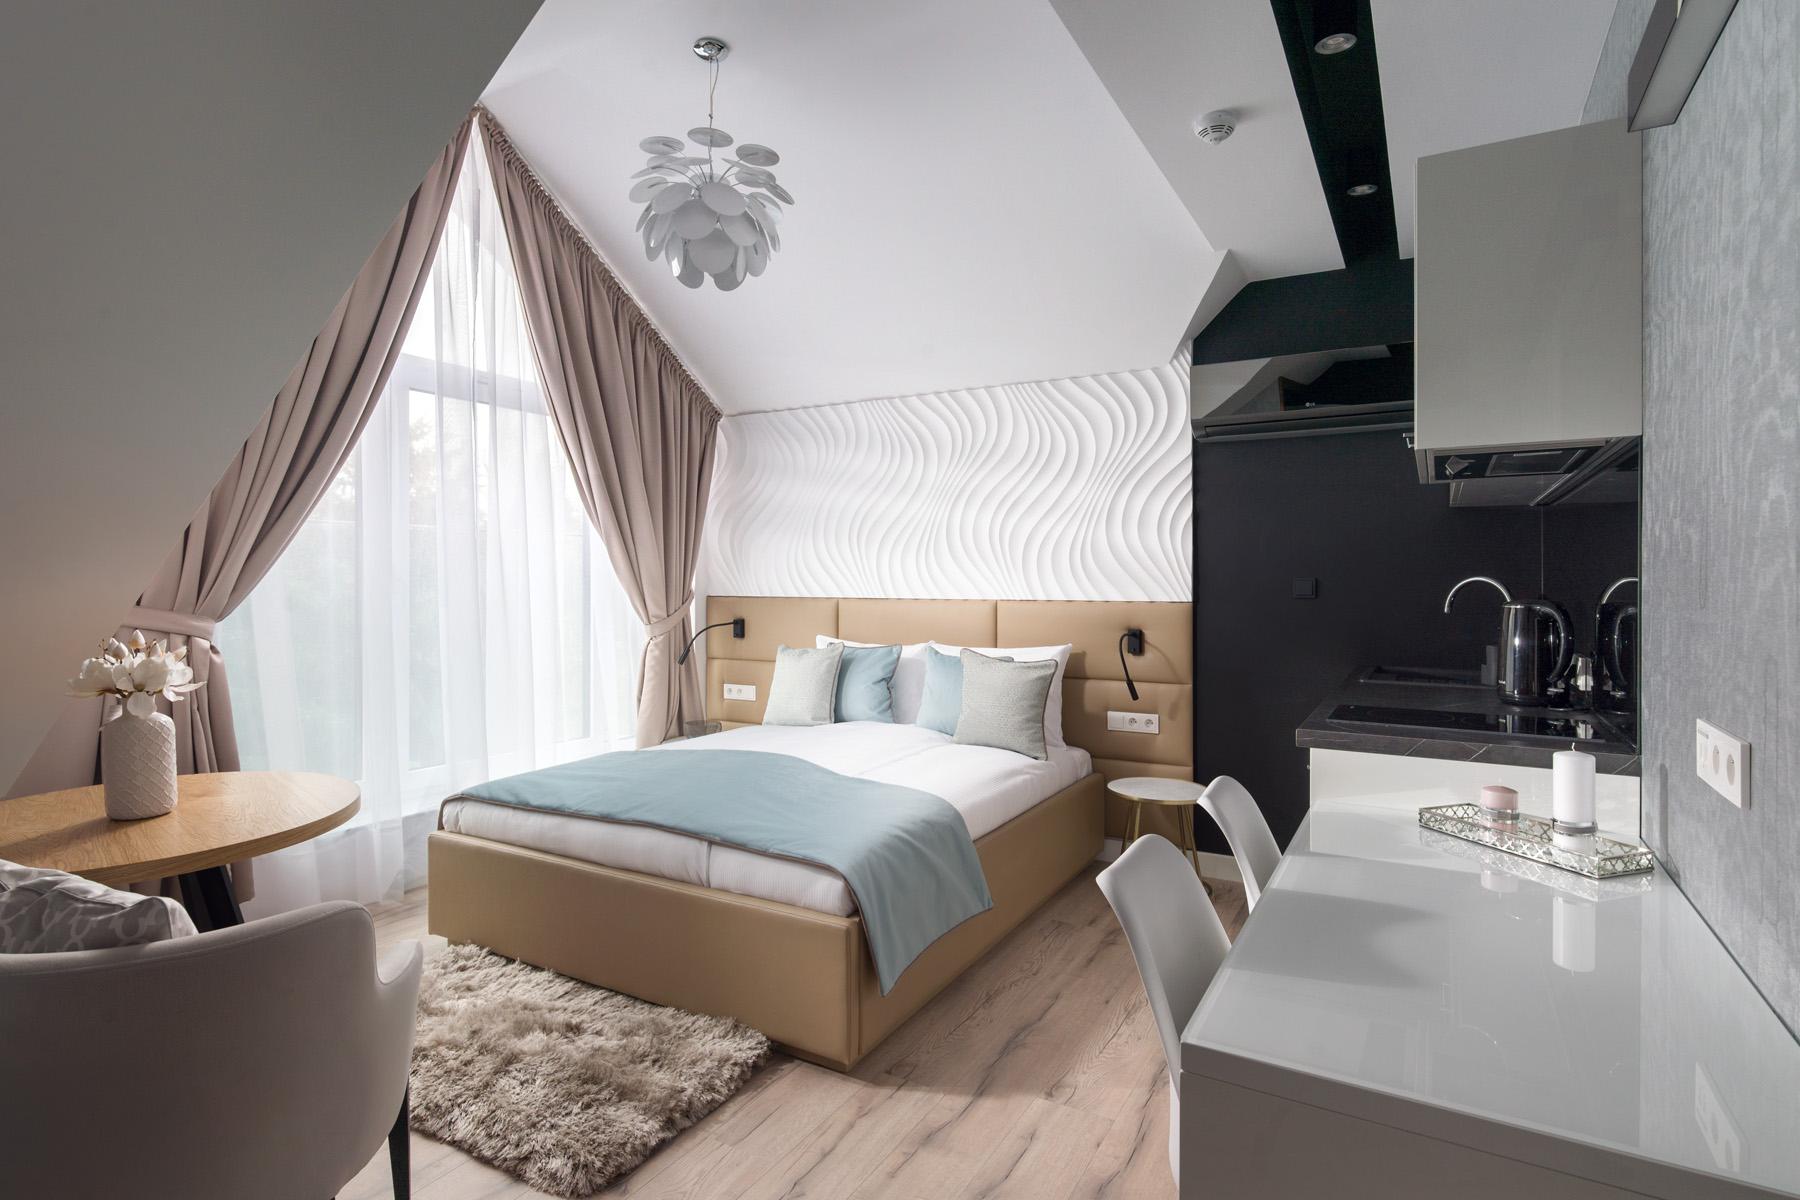 Hotel Sopot #1 (17).jpg